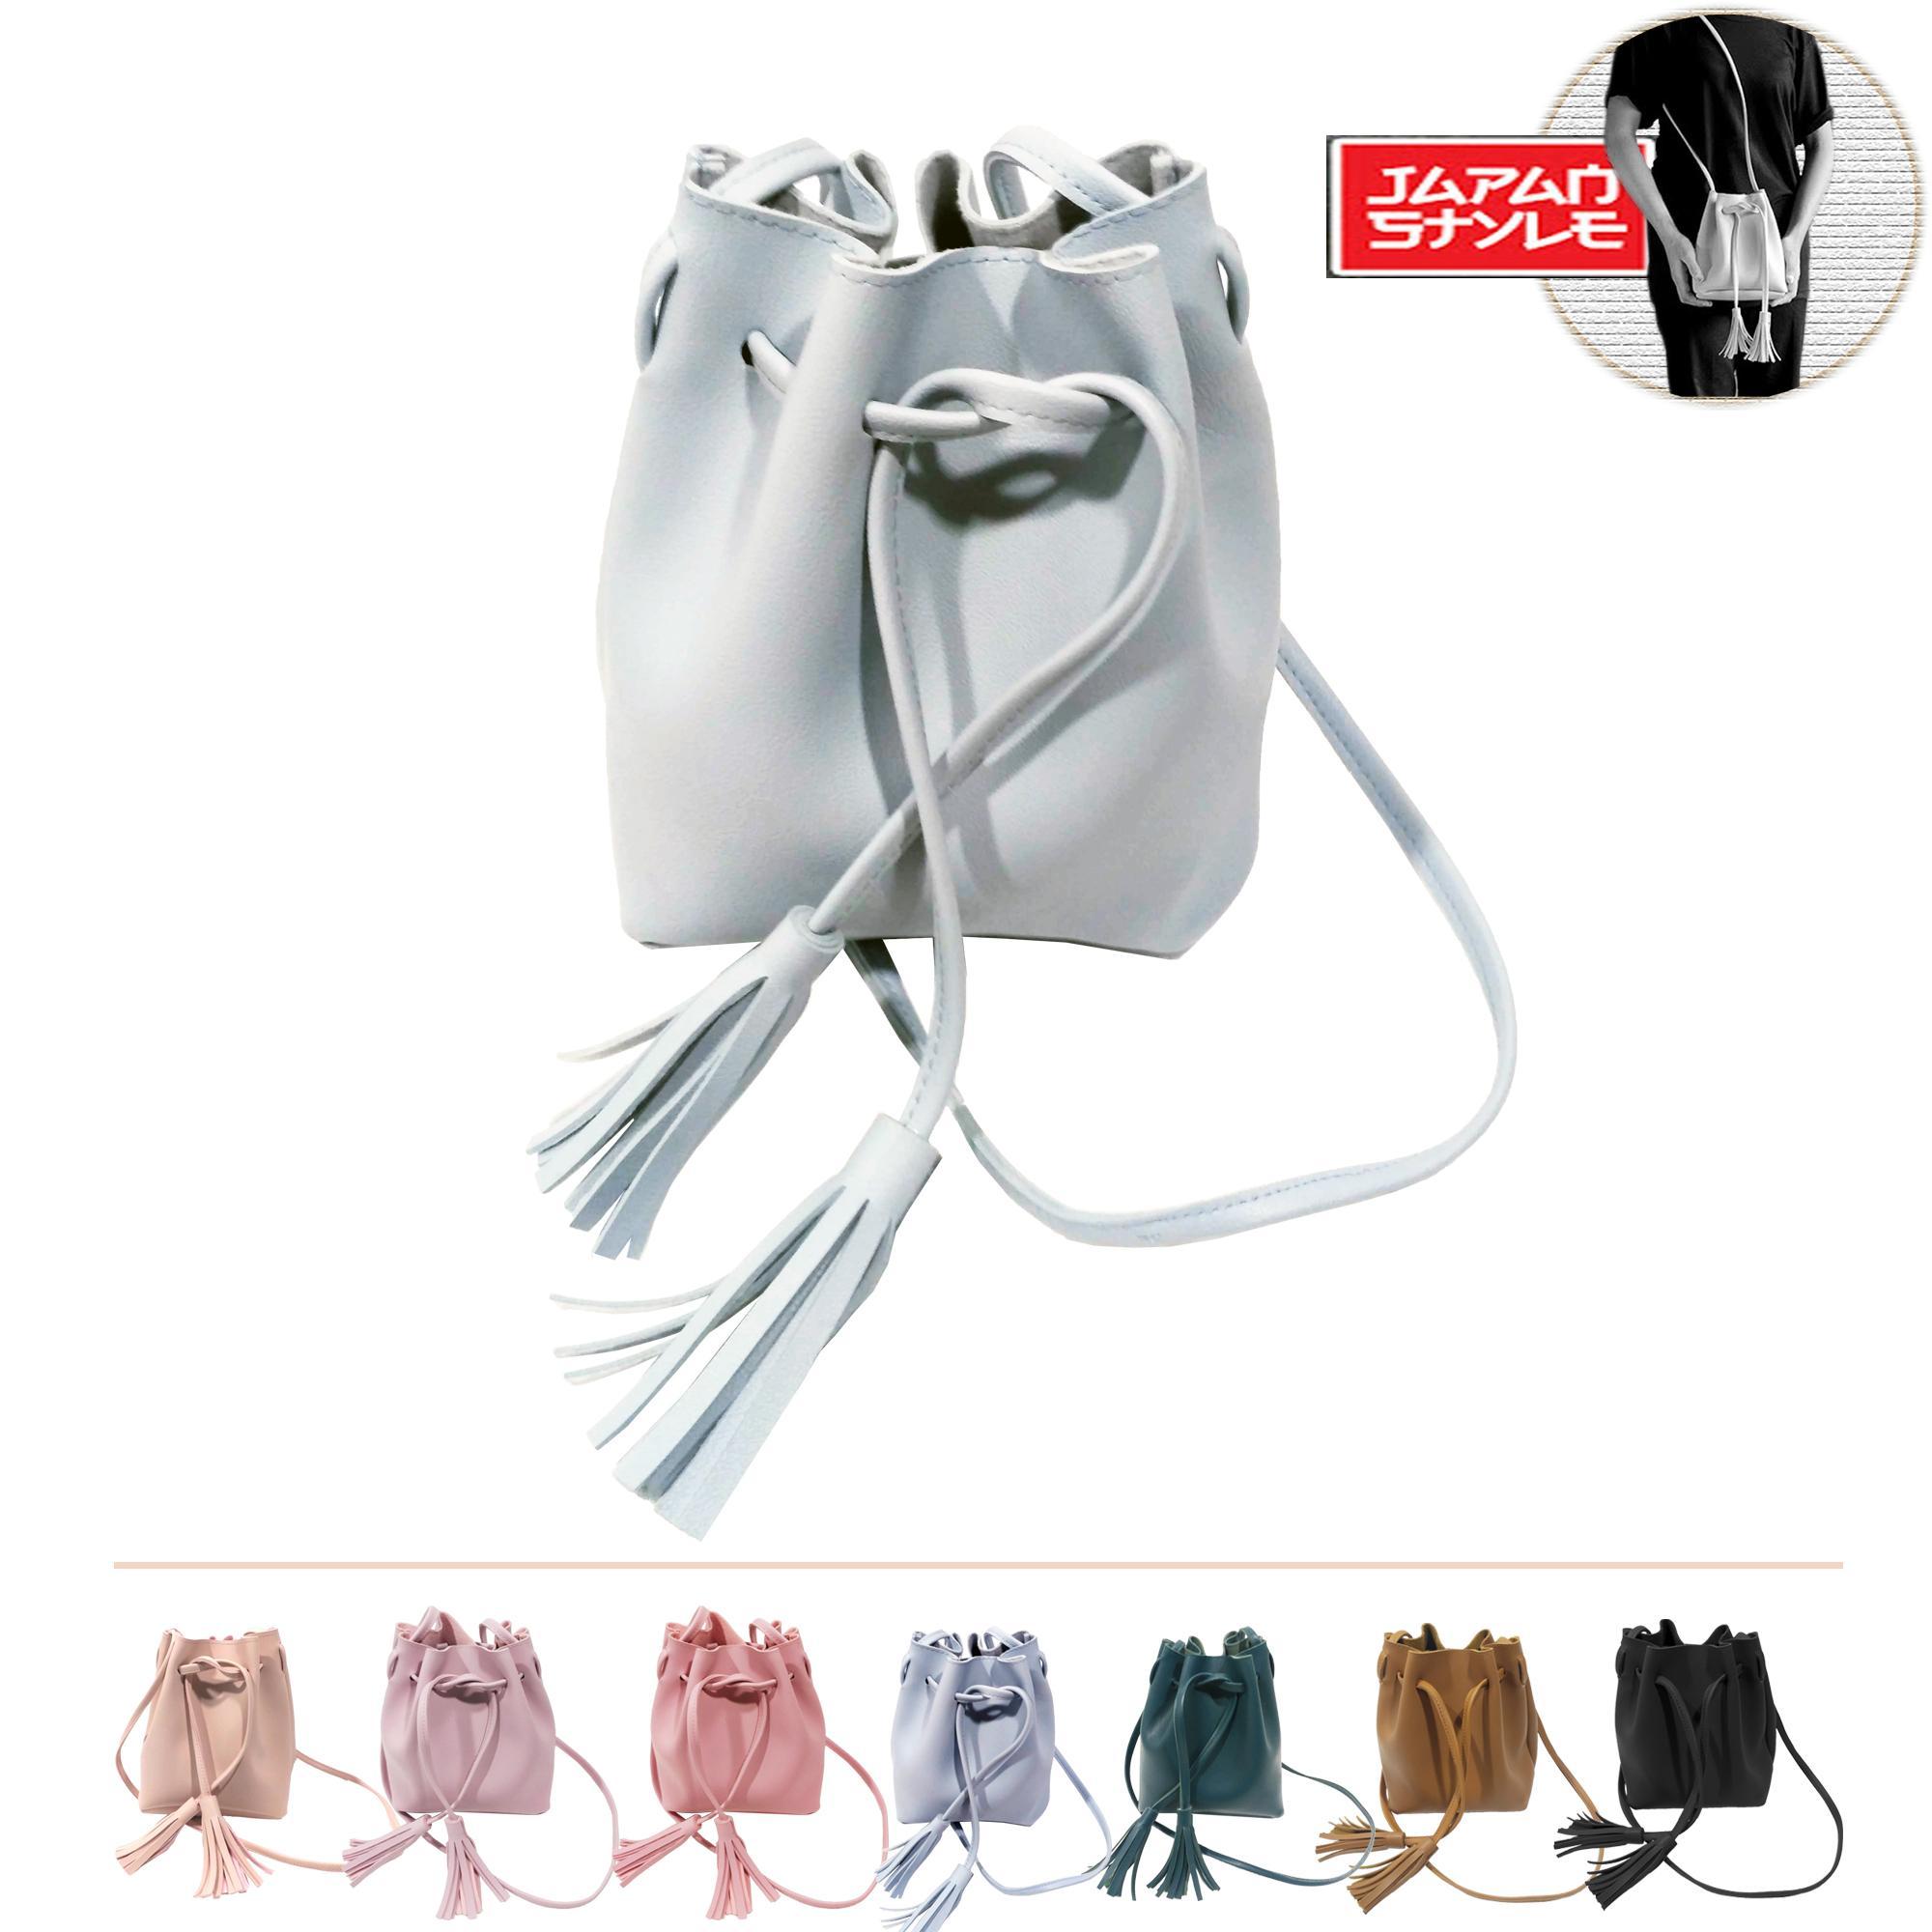 Tas Selempang Badan Wanita Terbaik Kipling Slingbag Handphone Sling Bag Serut Bucket Japan Style